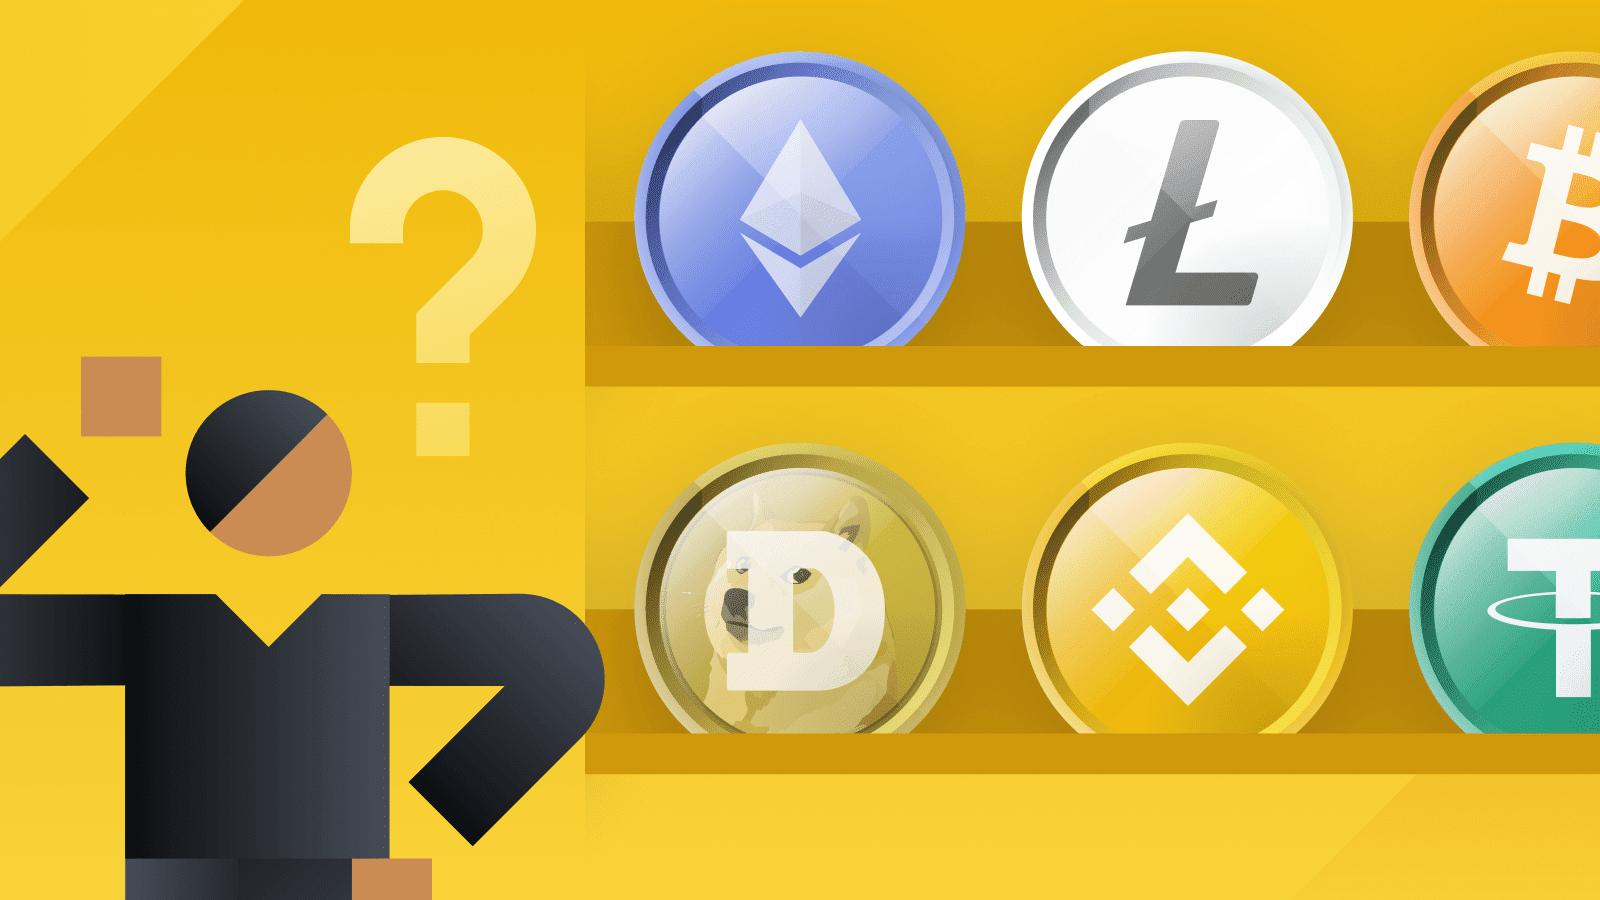 Exchange Altcoins for Major Crypto Coins.